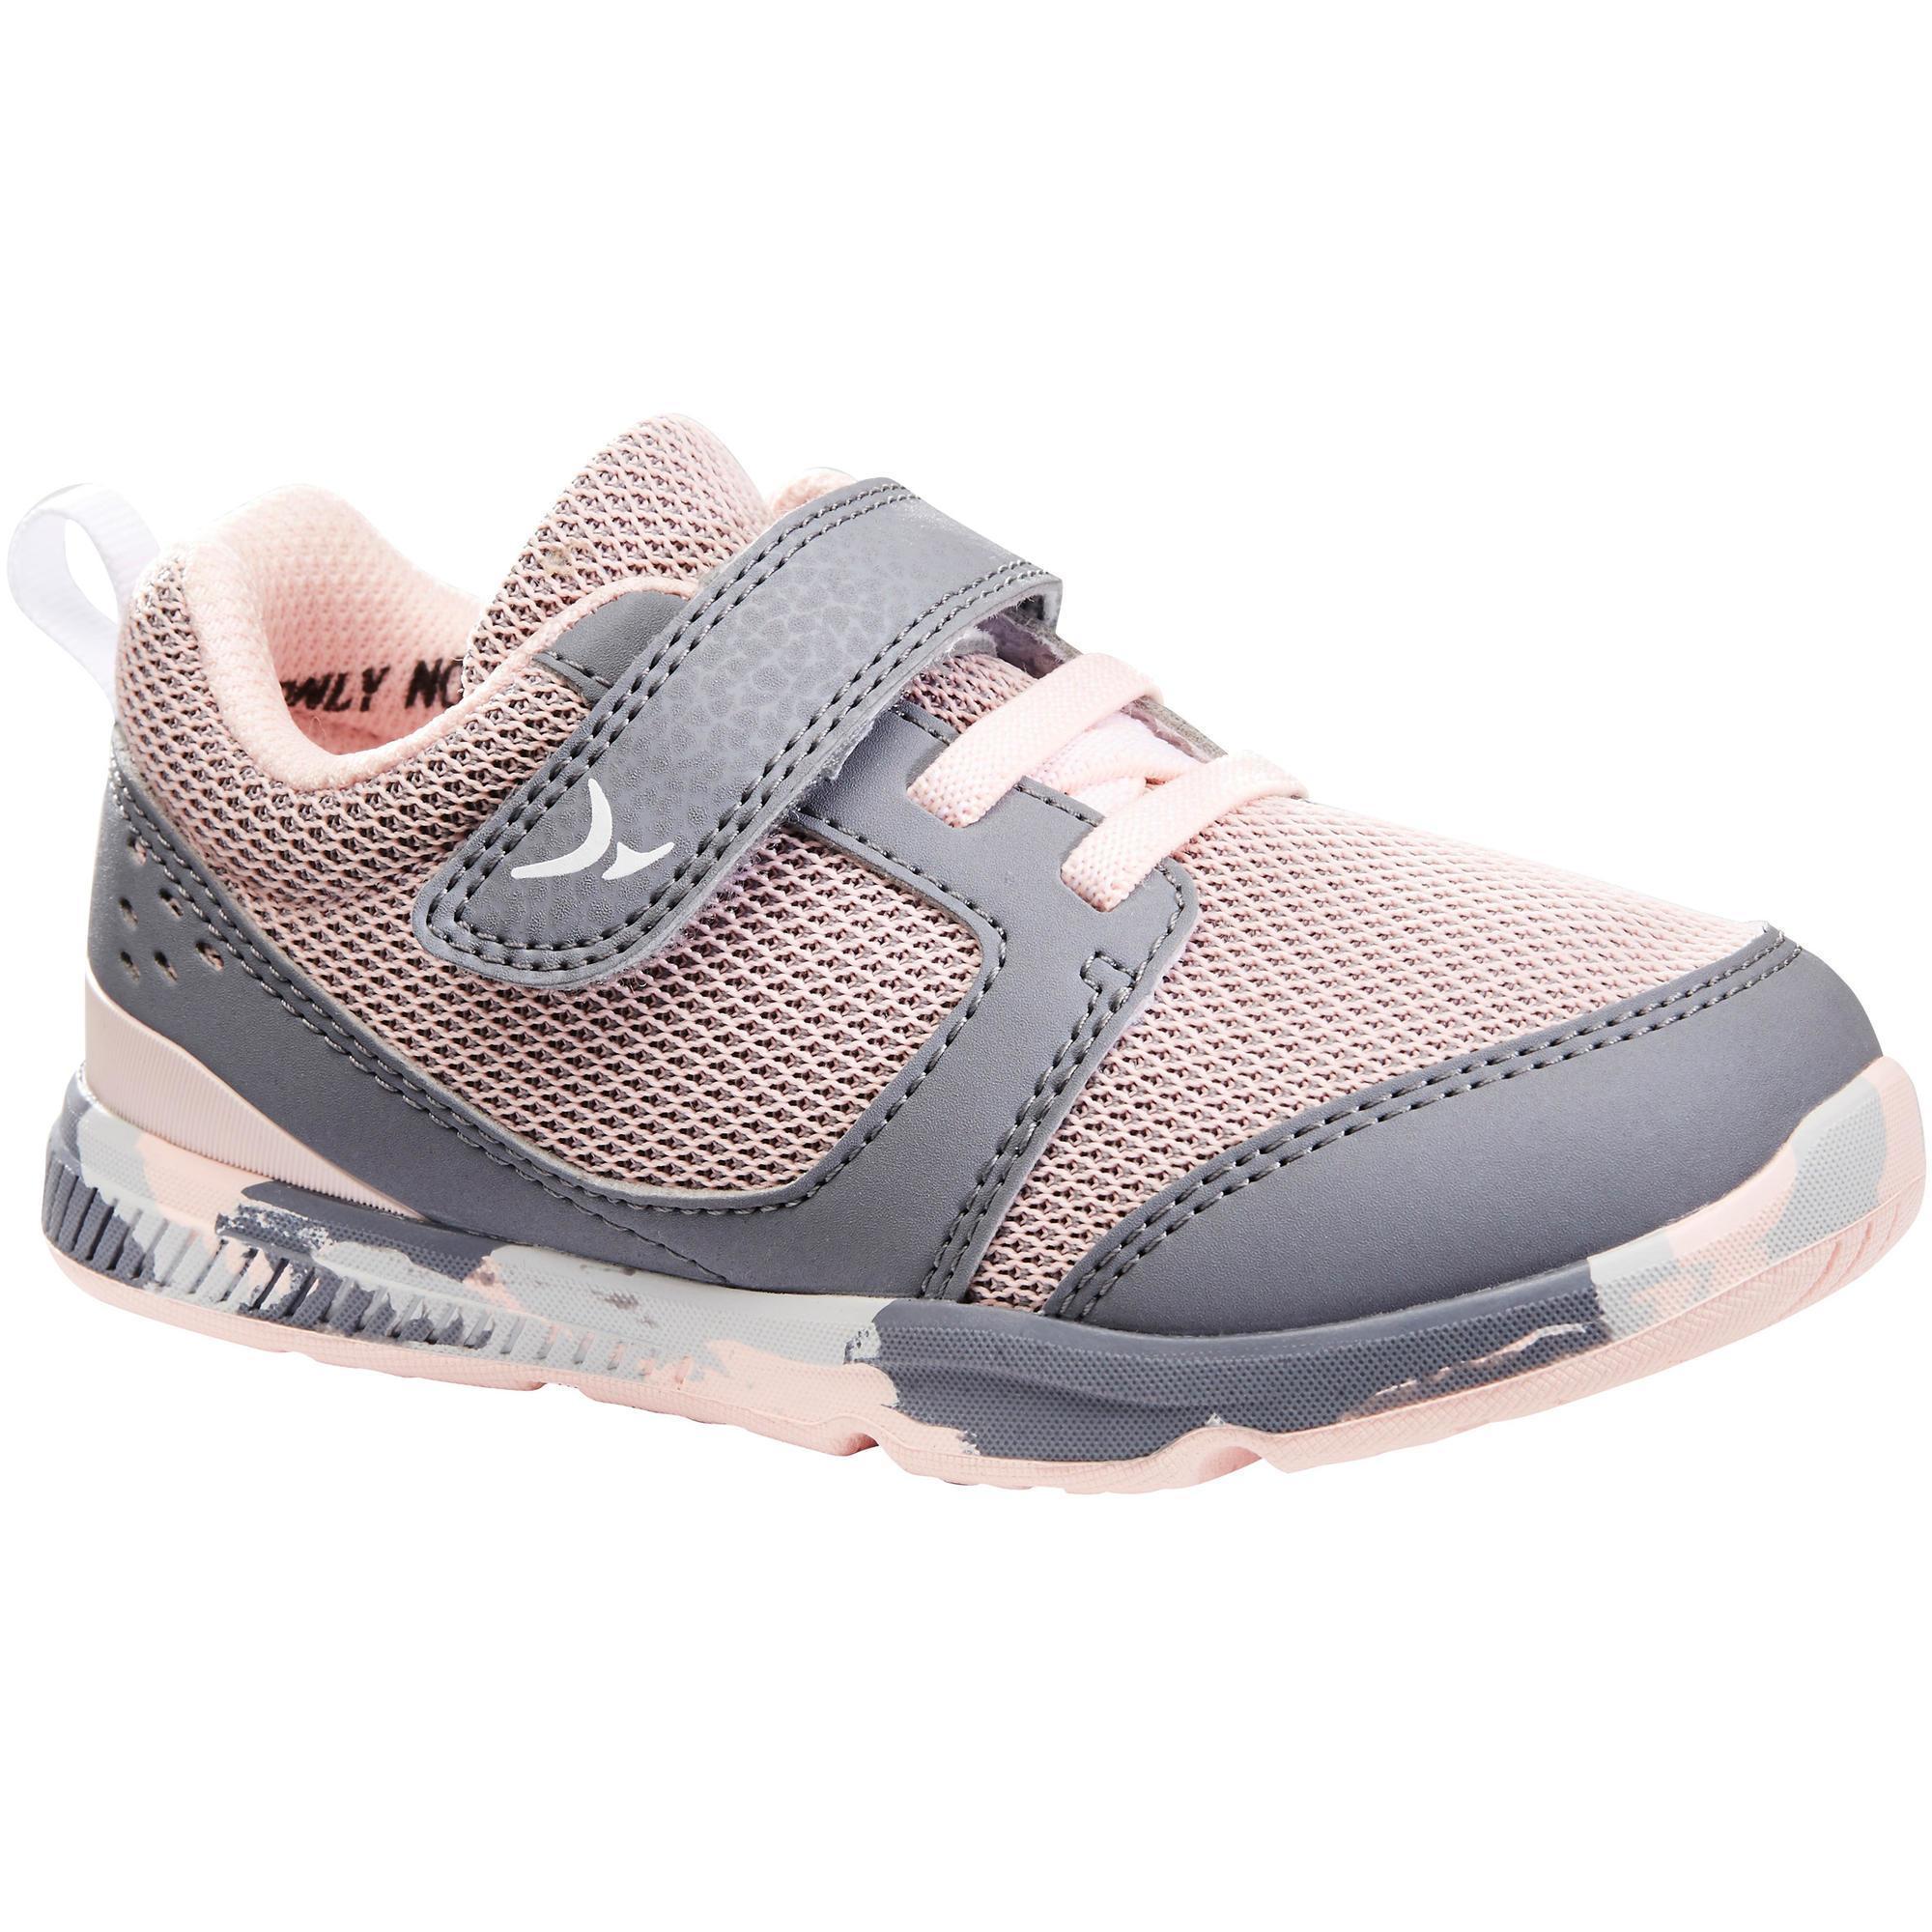 I Move Gym Shoes - Pink/Grey   Domyos